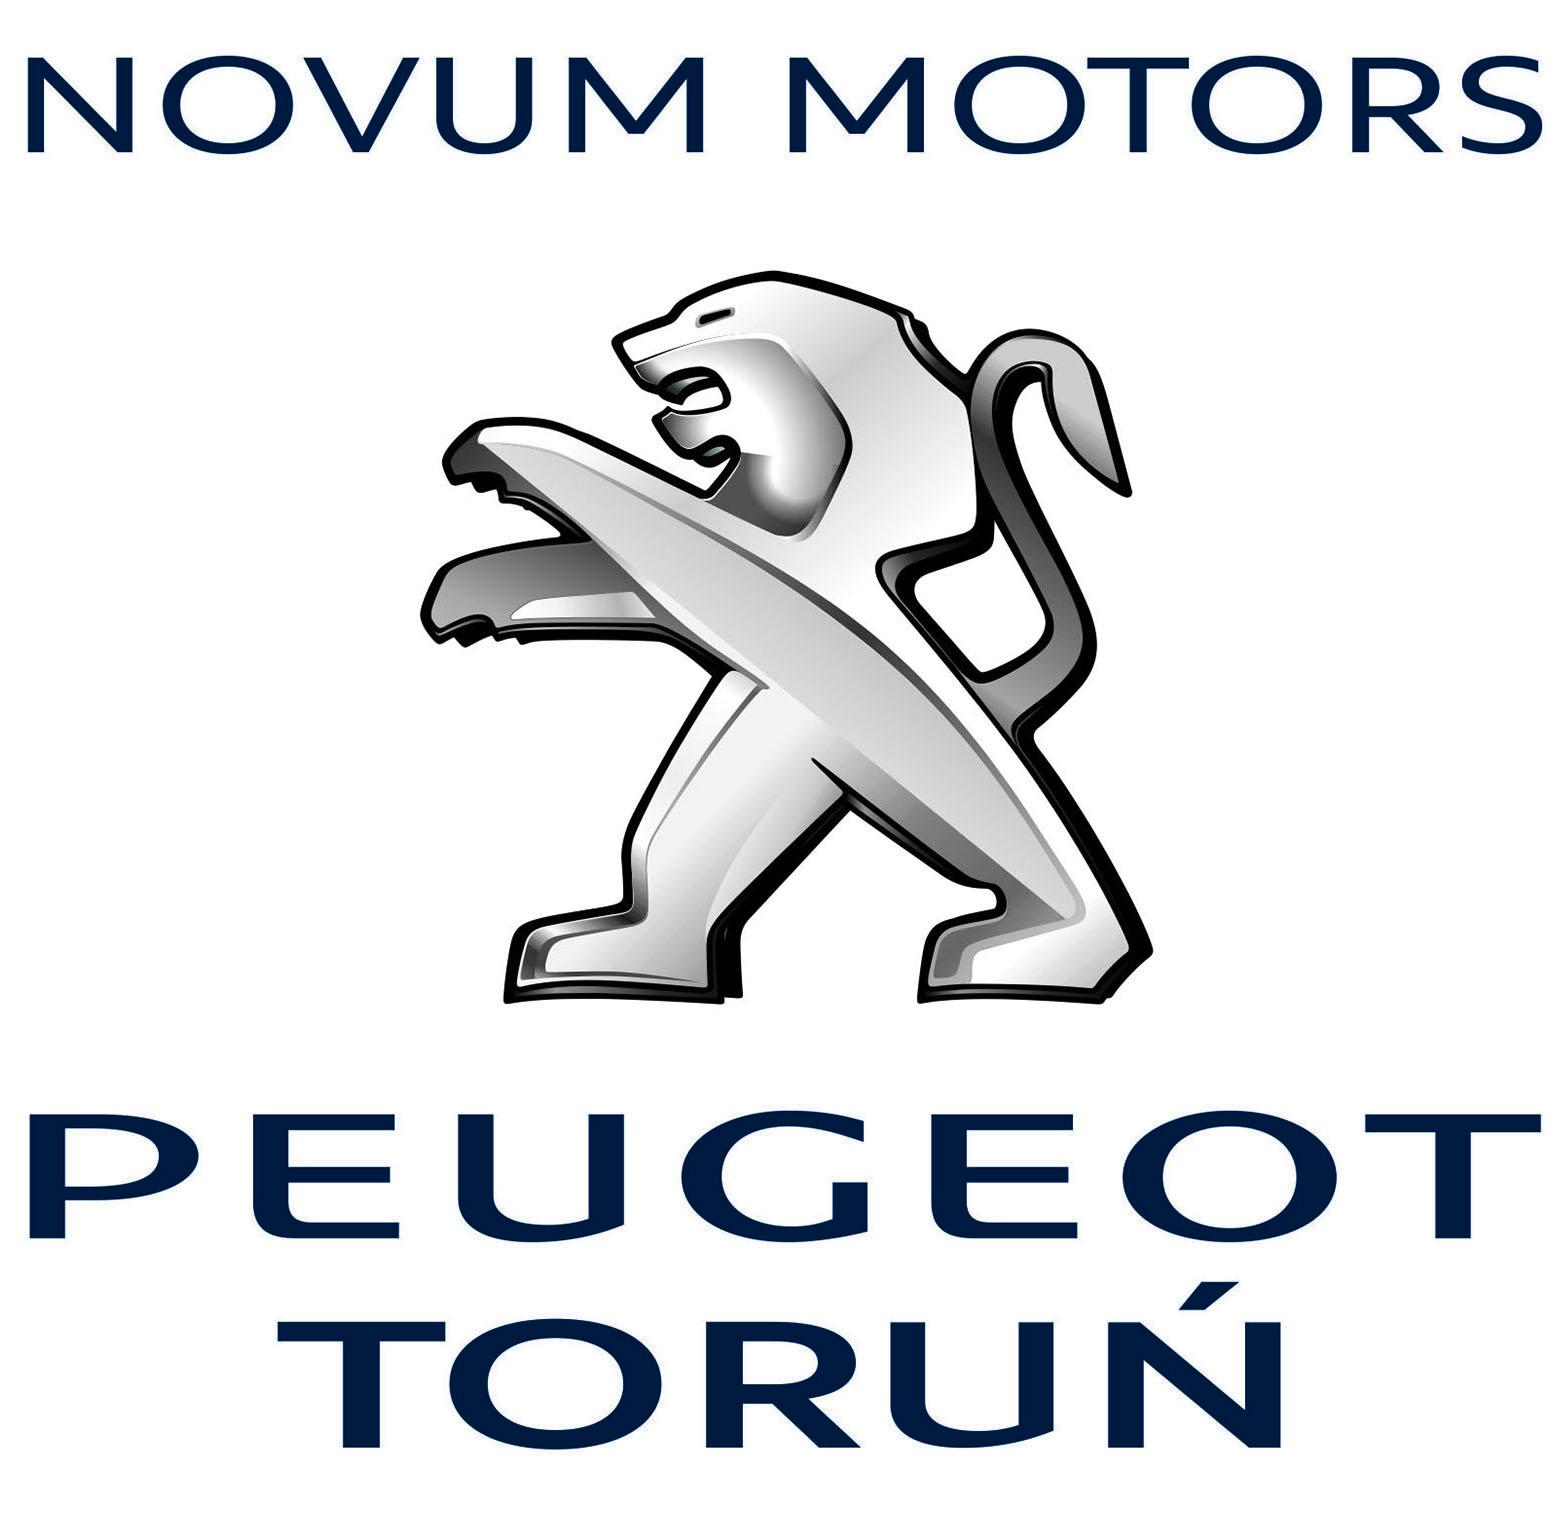 Novum Motors 100